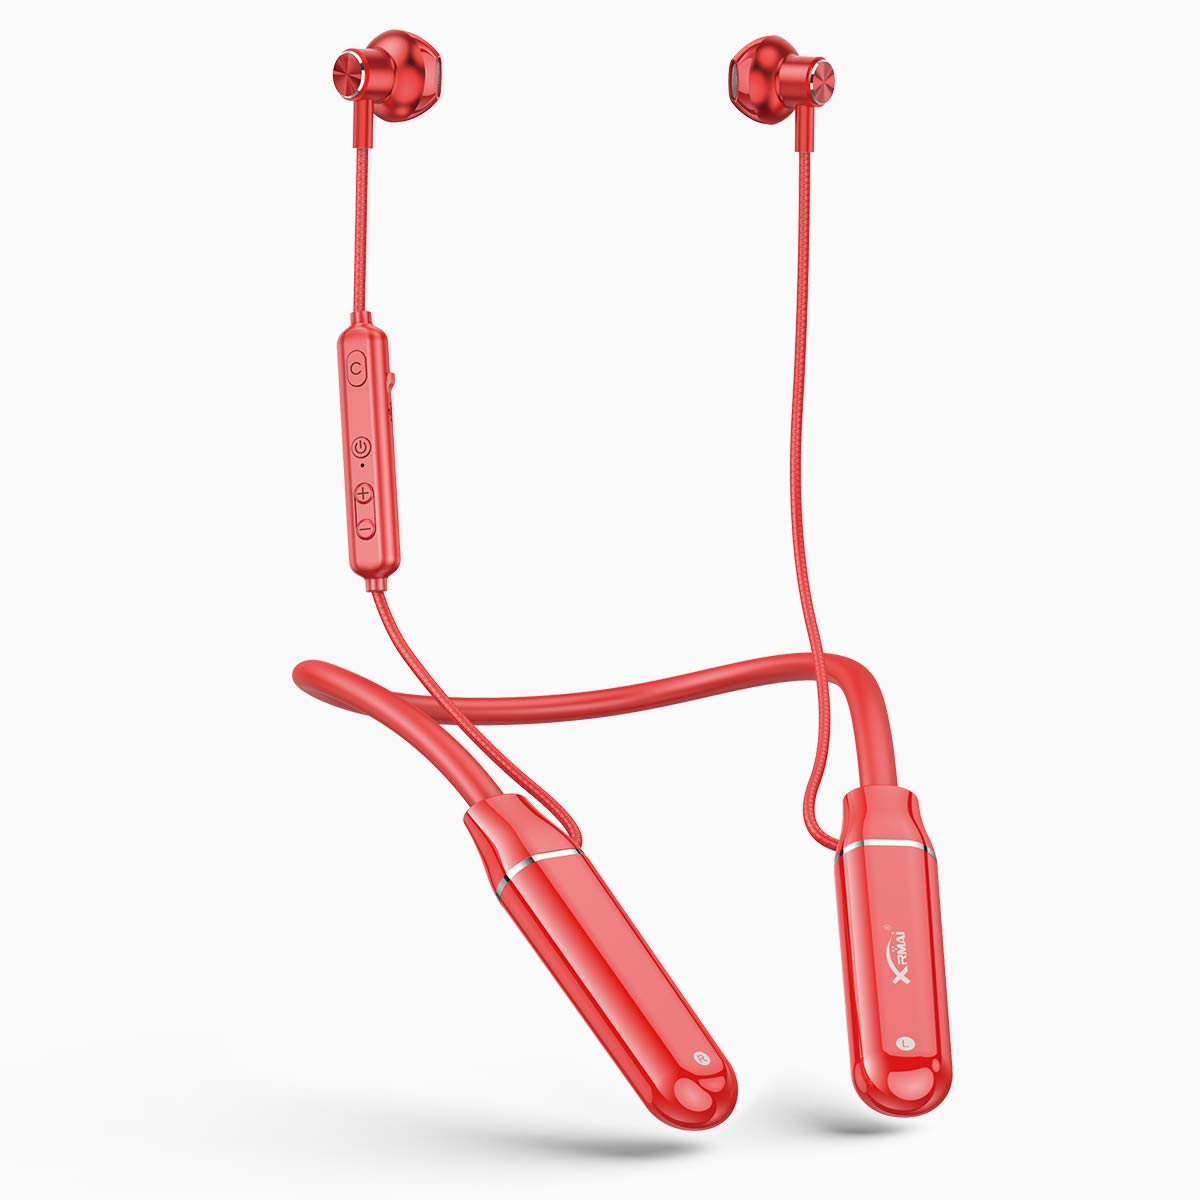 Auriculares Earbuds Inalambricos Hsbzus Canc. de Ruido Red